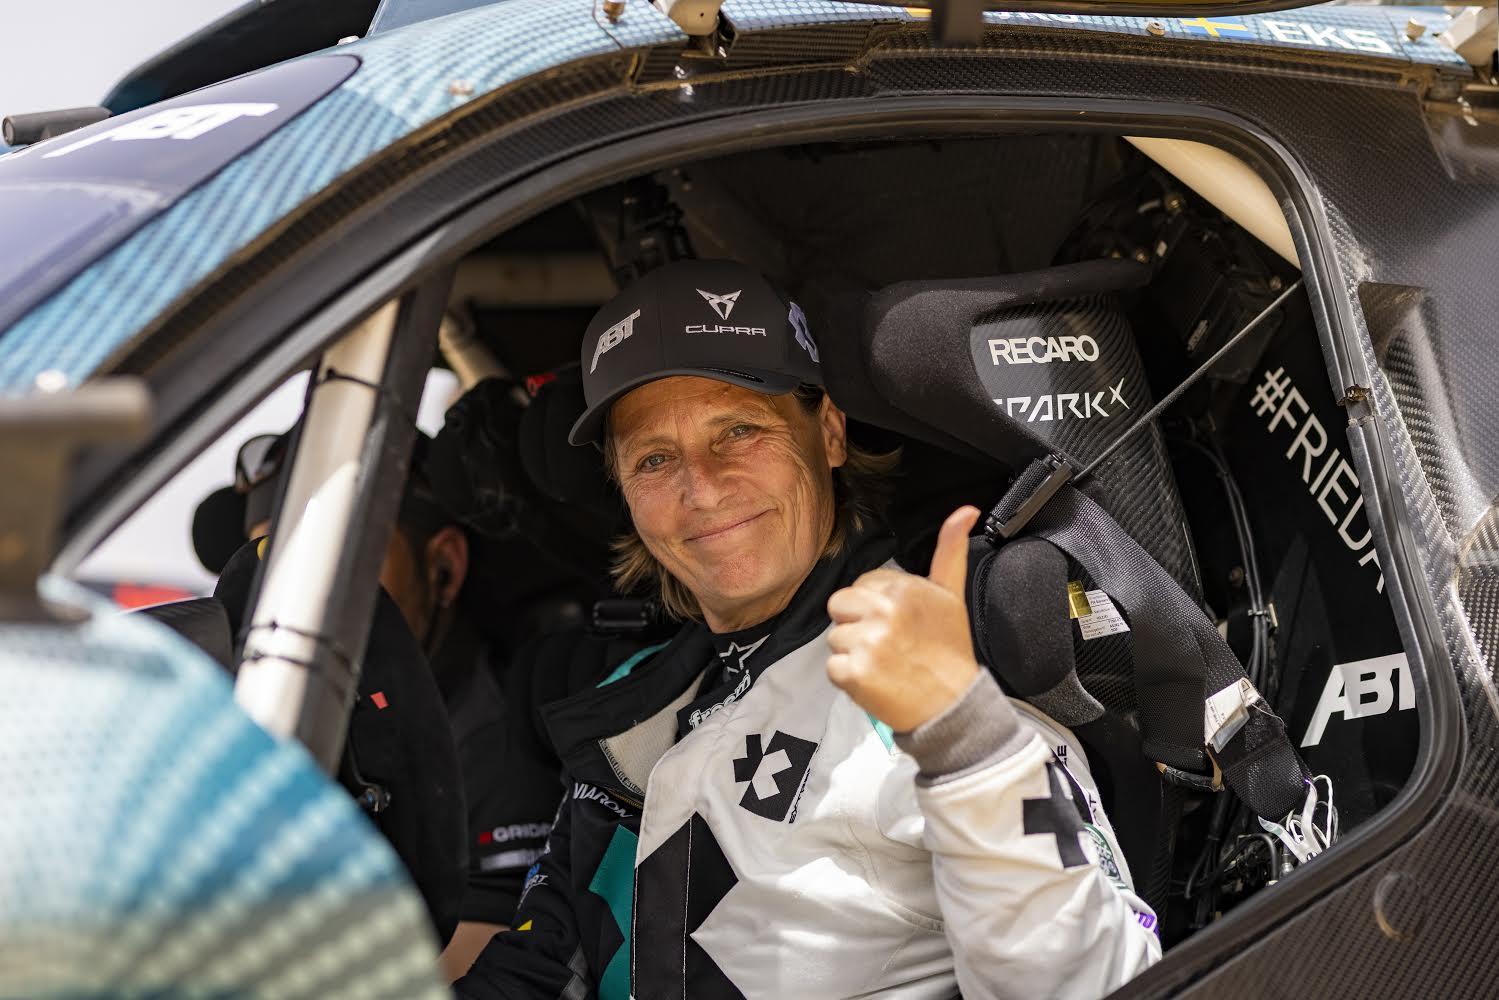 Jutta Kleinschmidt sonriente tras el Ocean X Prix